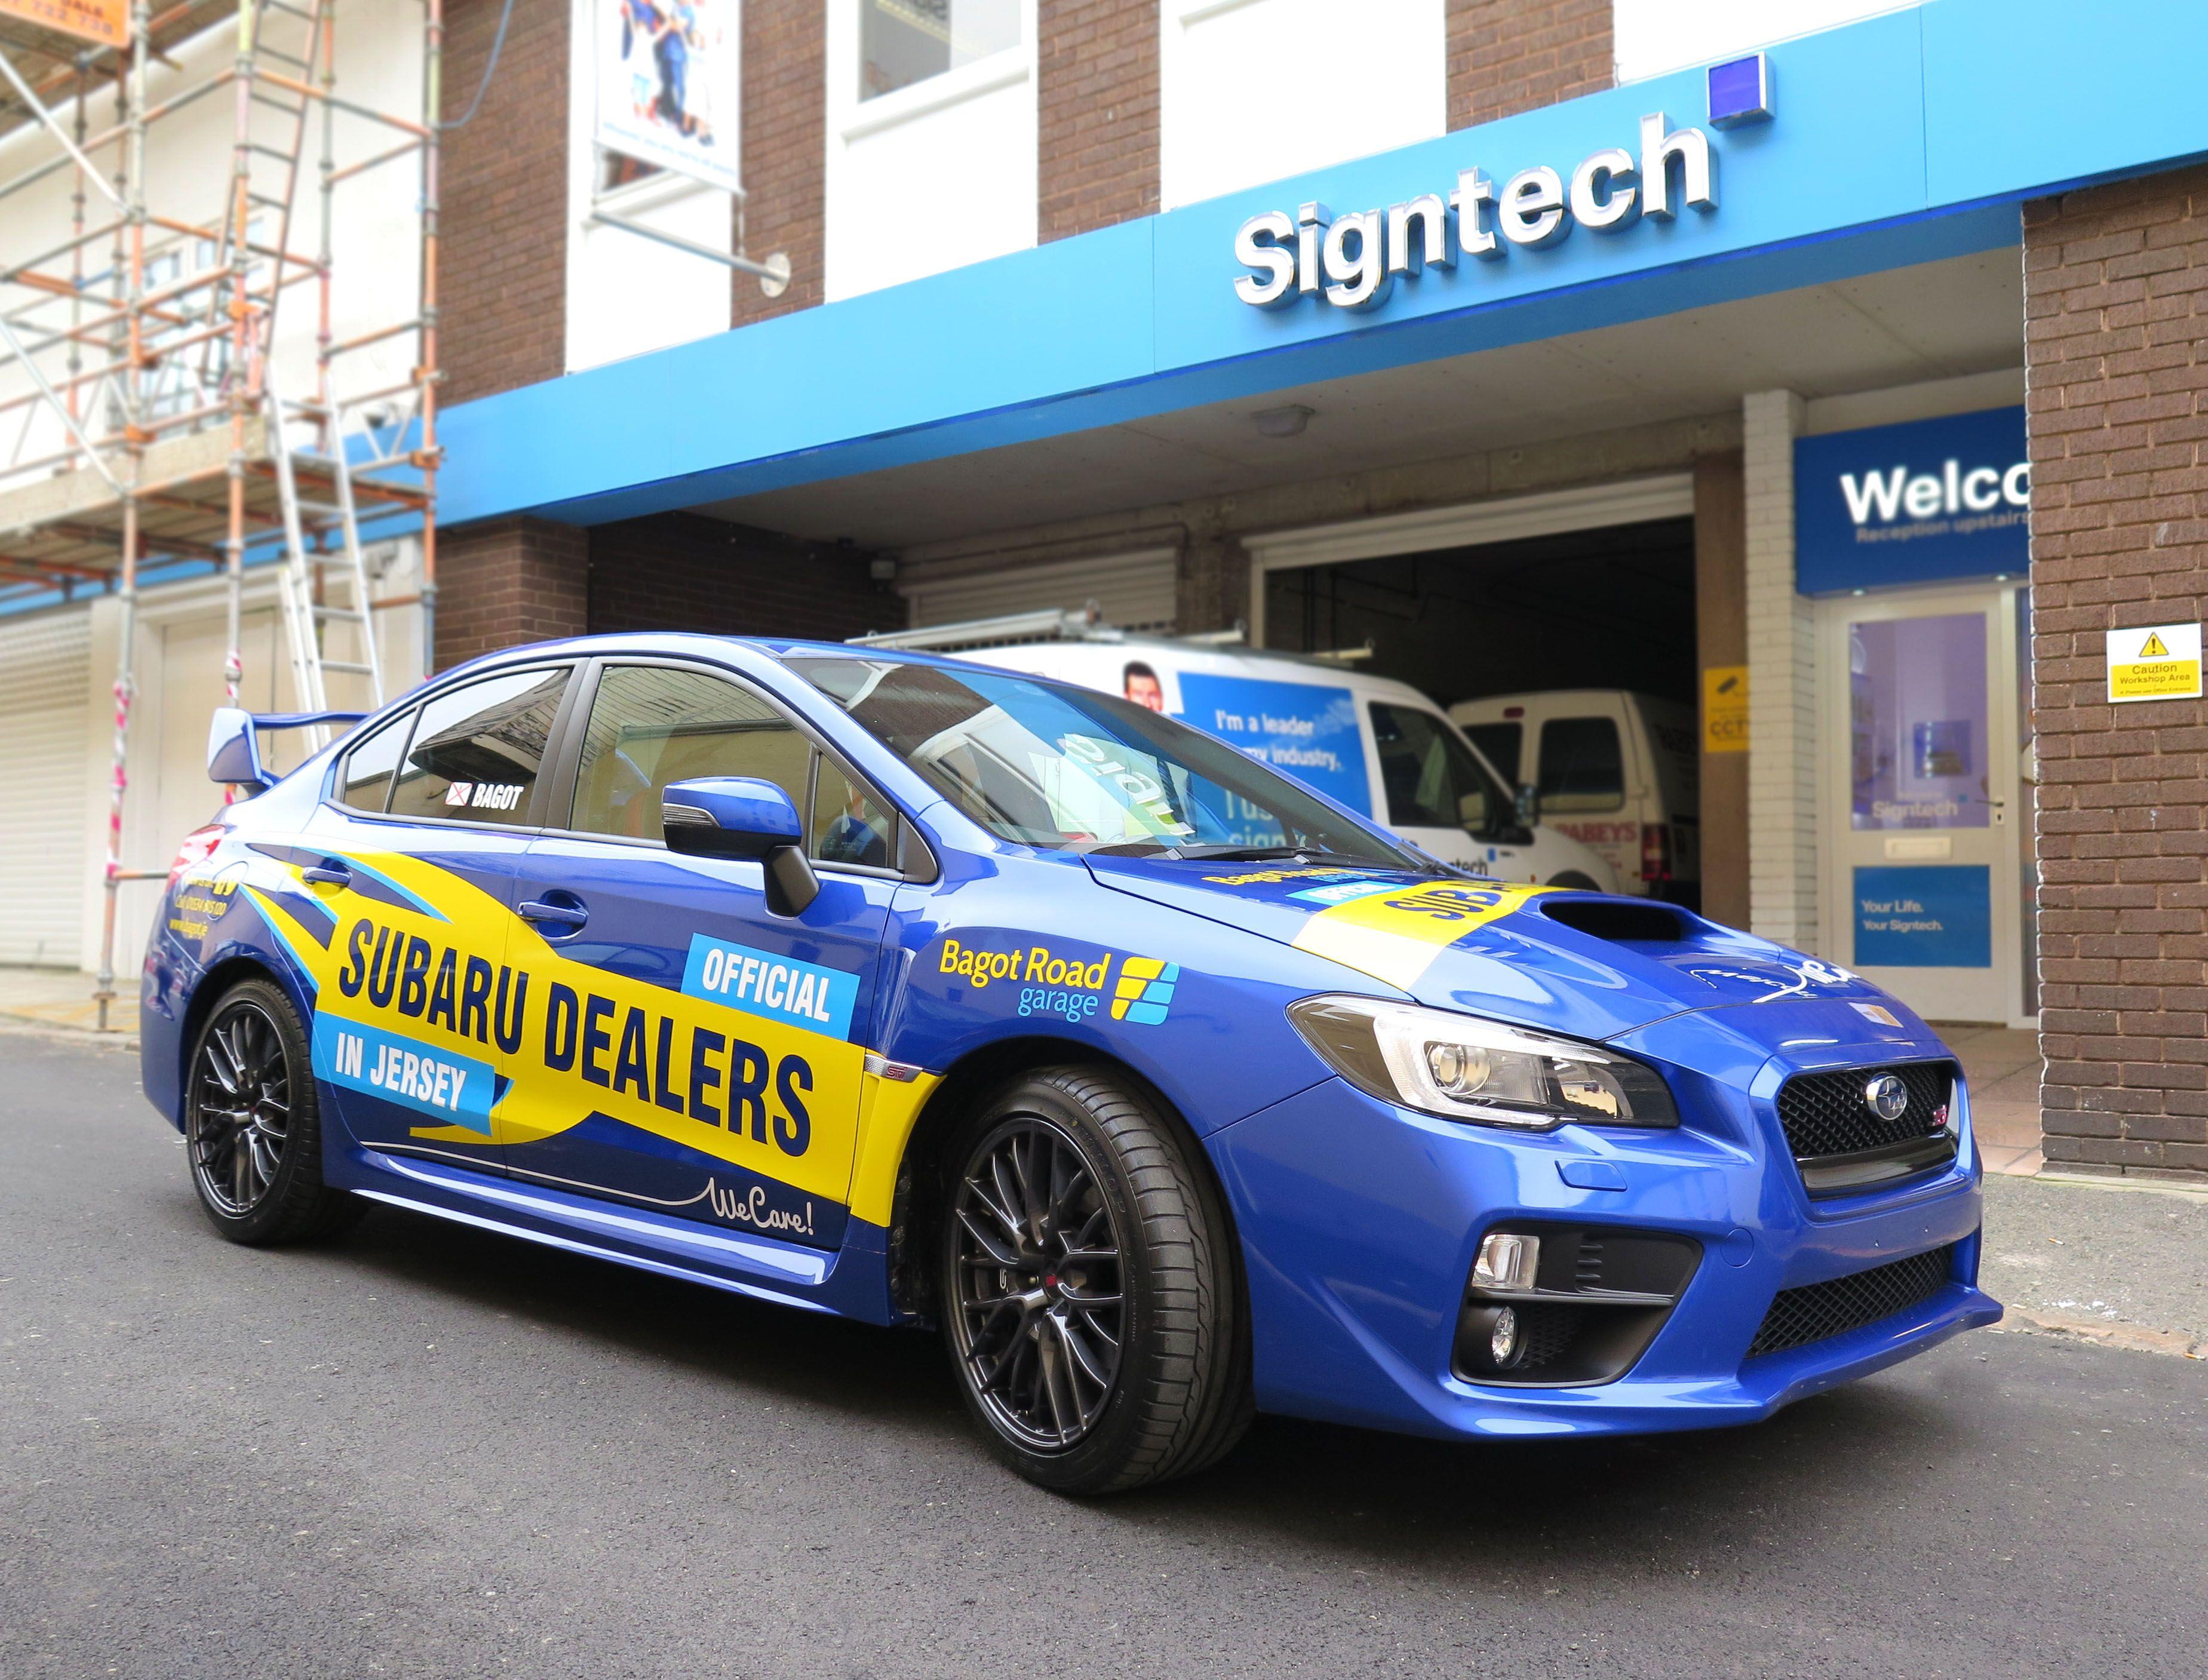 Subaru Dealers Ma >> Bagot Road Subaru Graphics Vehicle Graphics Vehicles